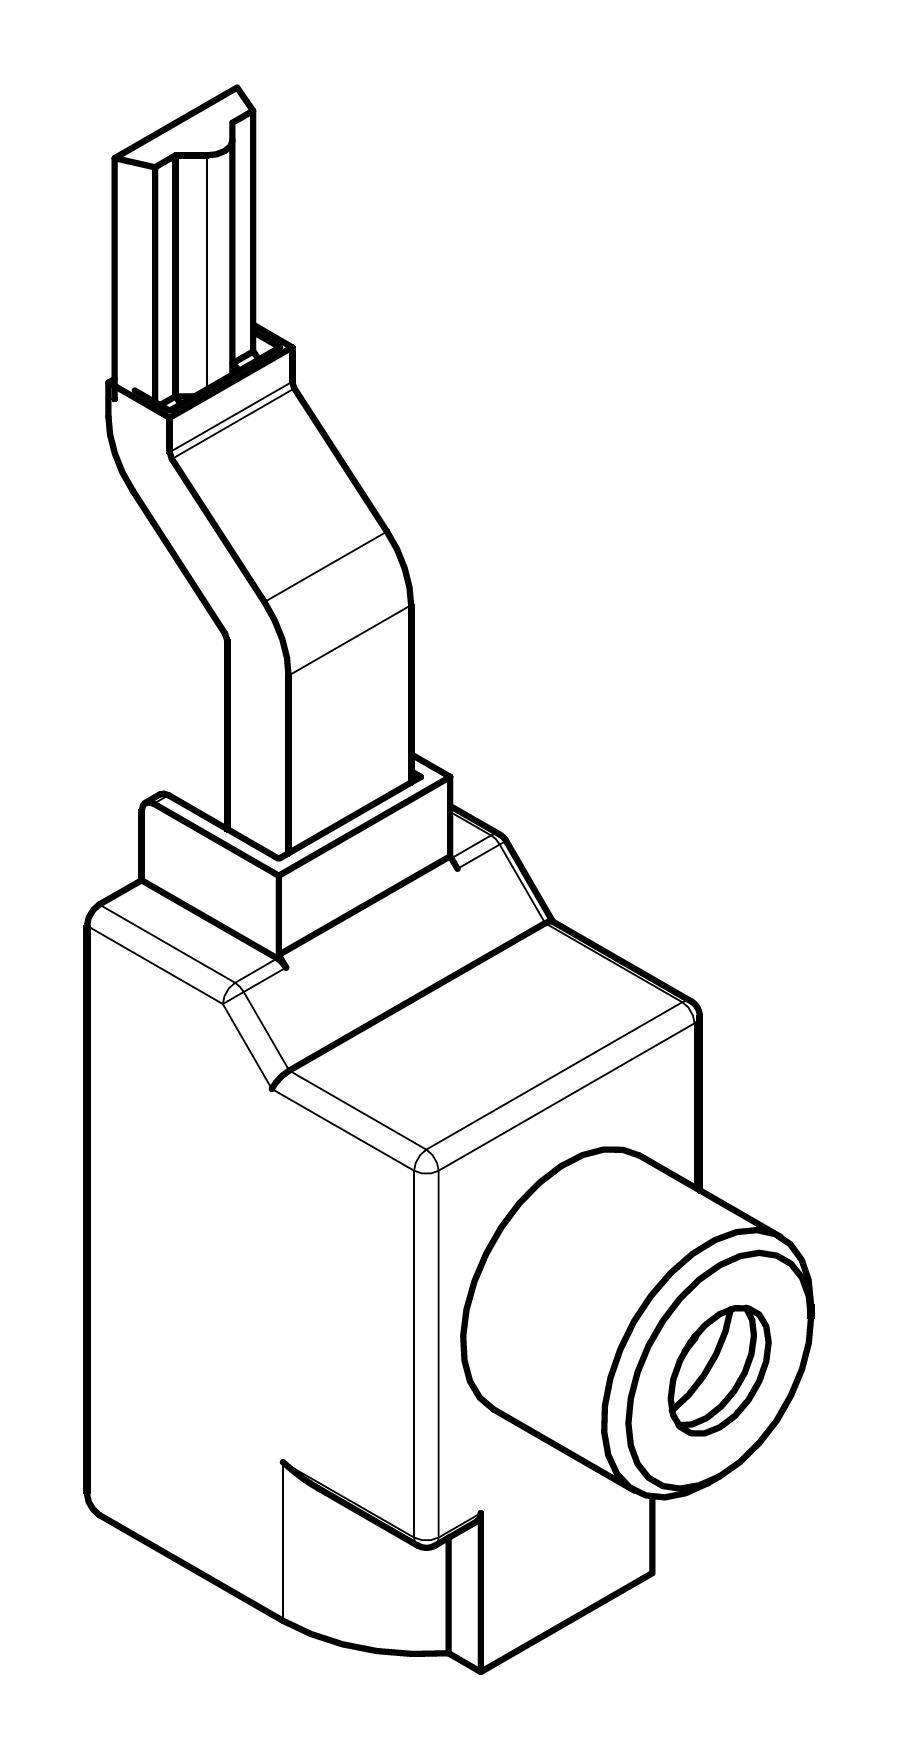 1 Stk Klemme 95mm² für ARROW II 000-NH-Trenner-Verschienung BS900191-A